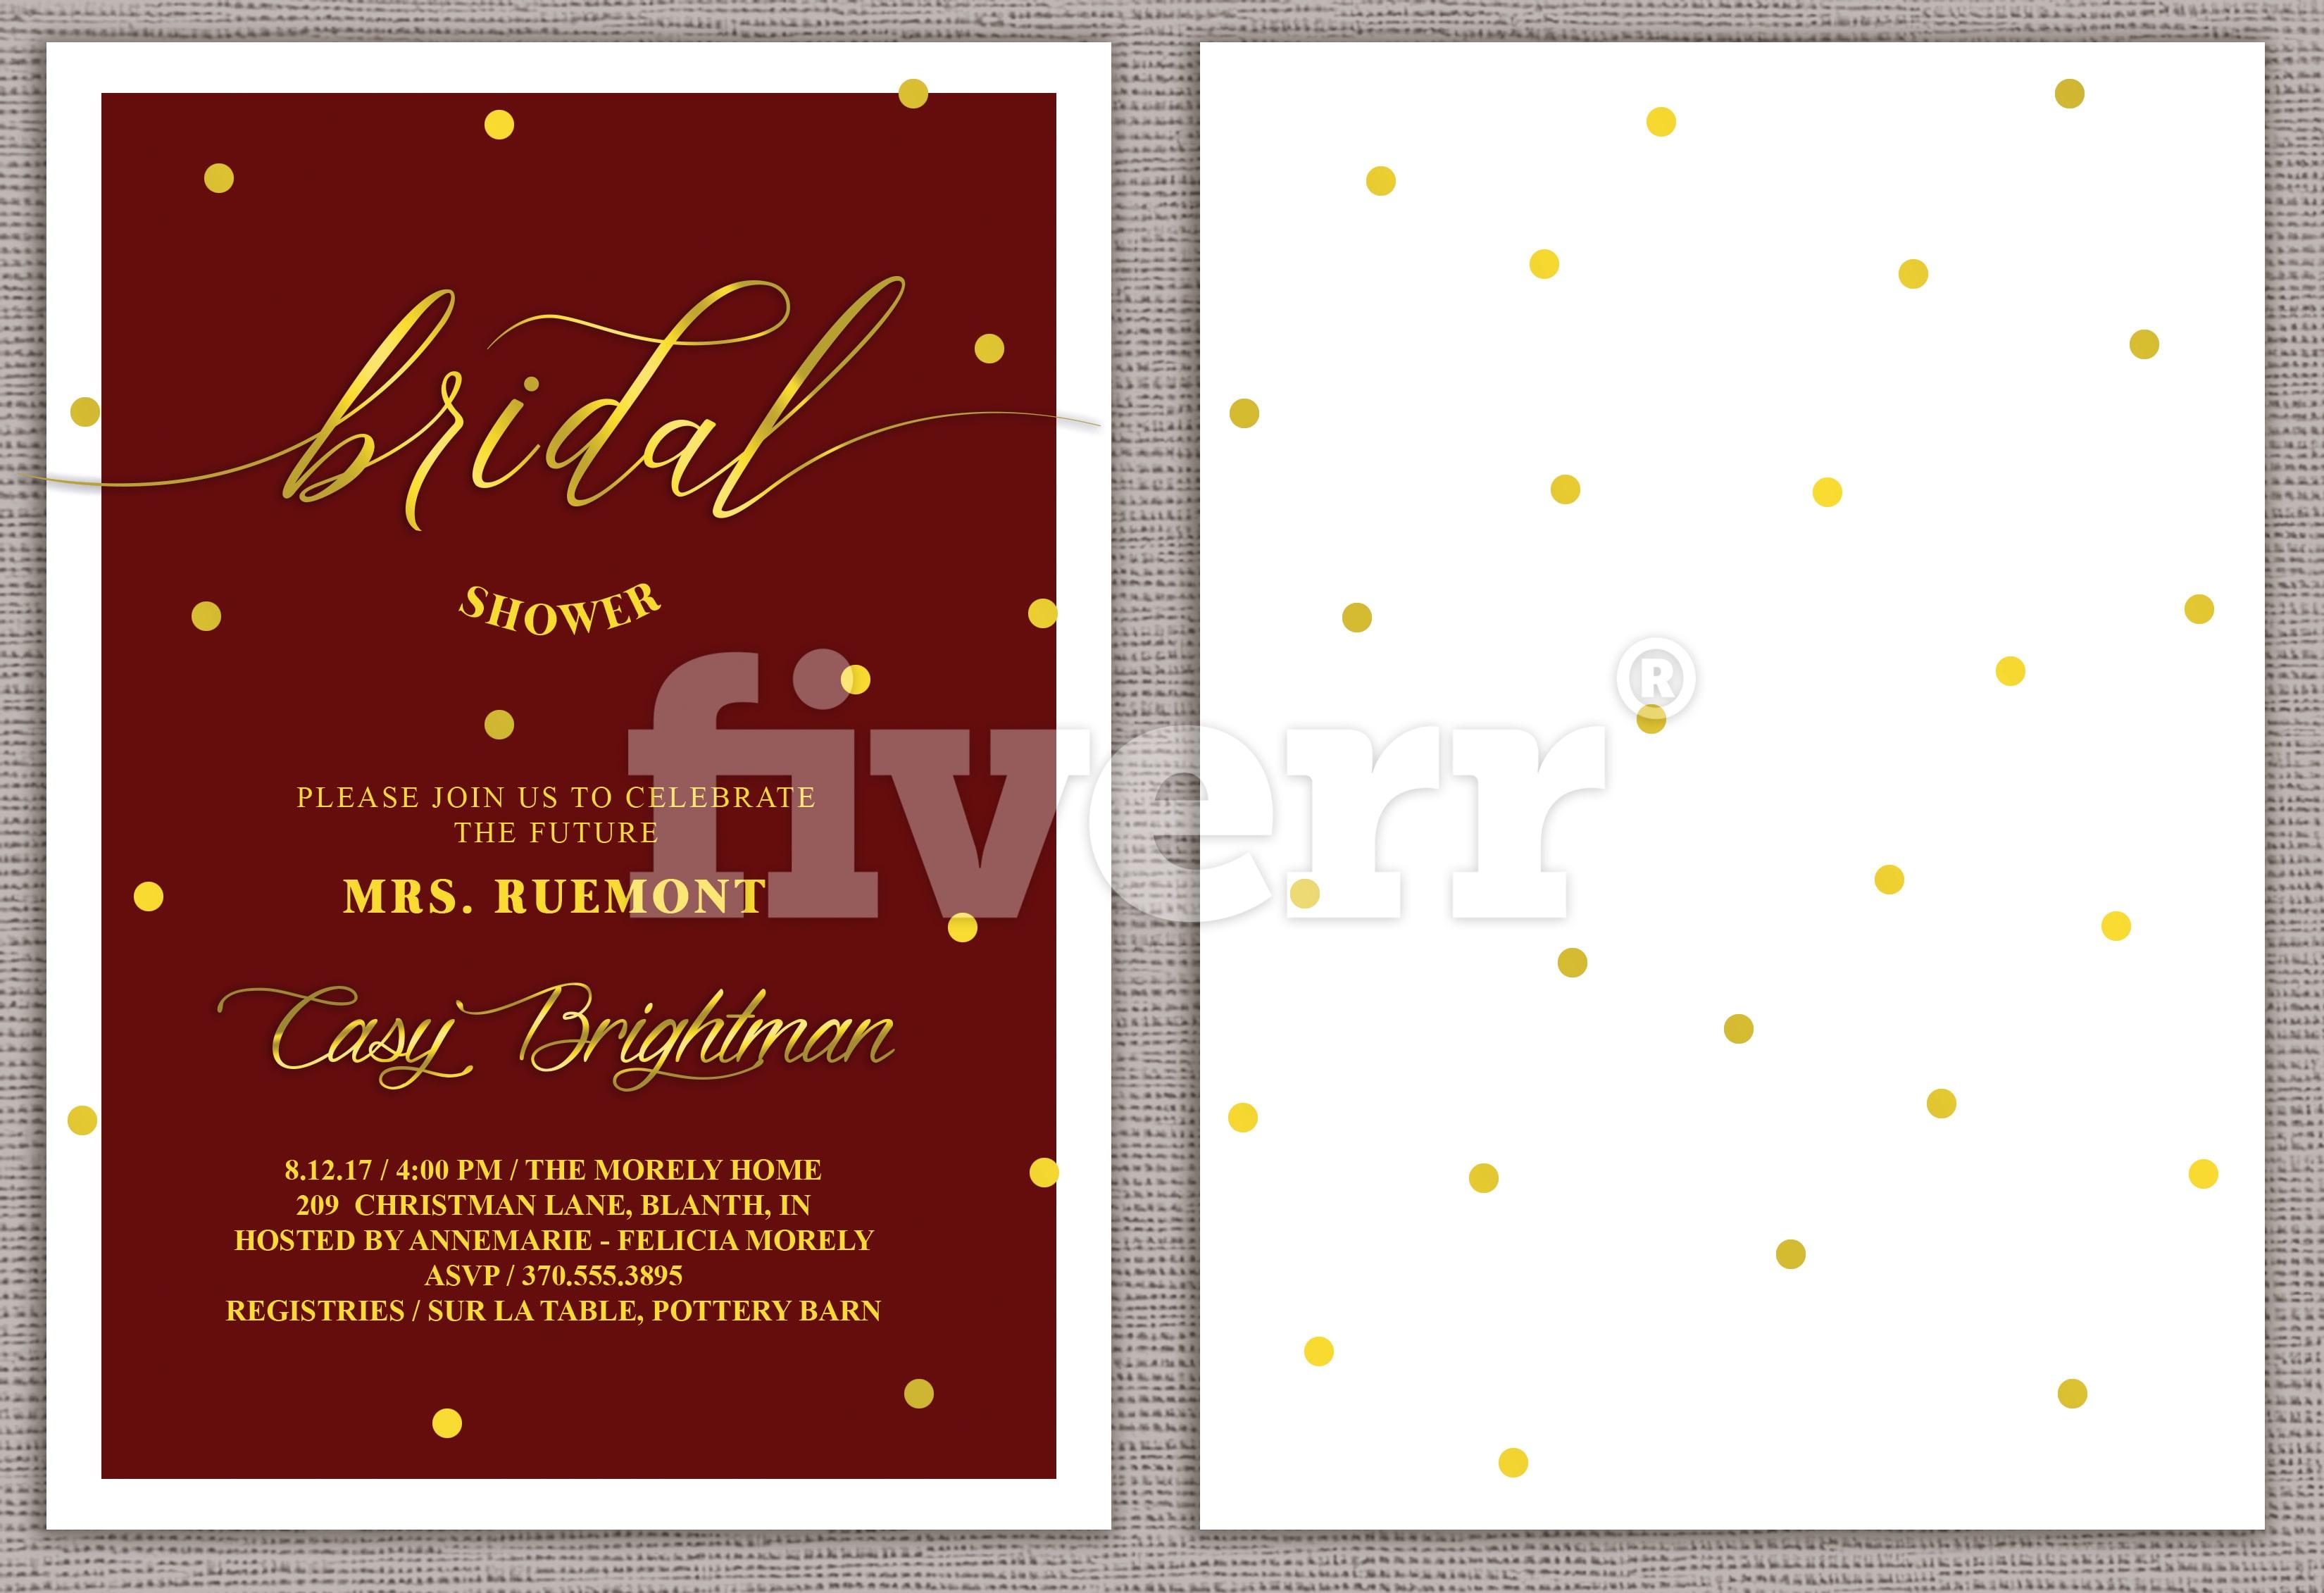 Design beautiful wedding invitations by Creativethings